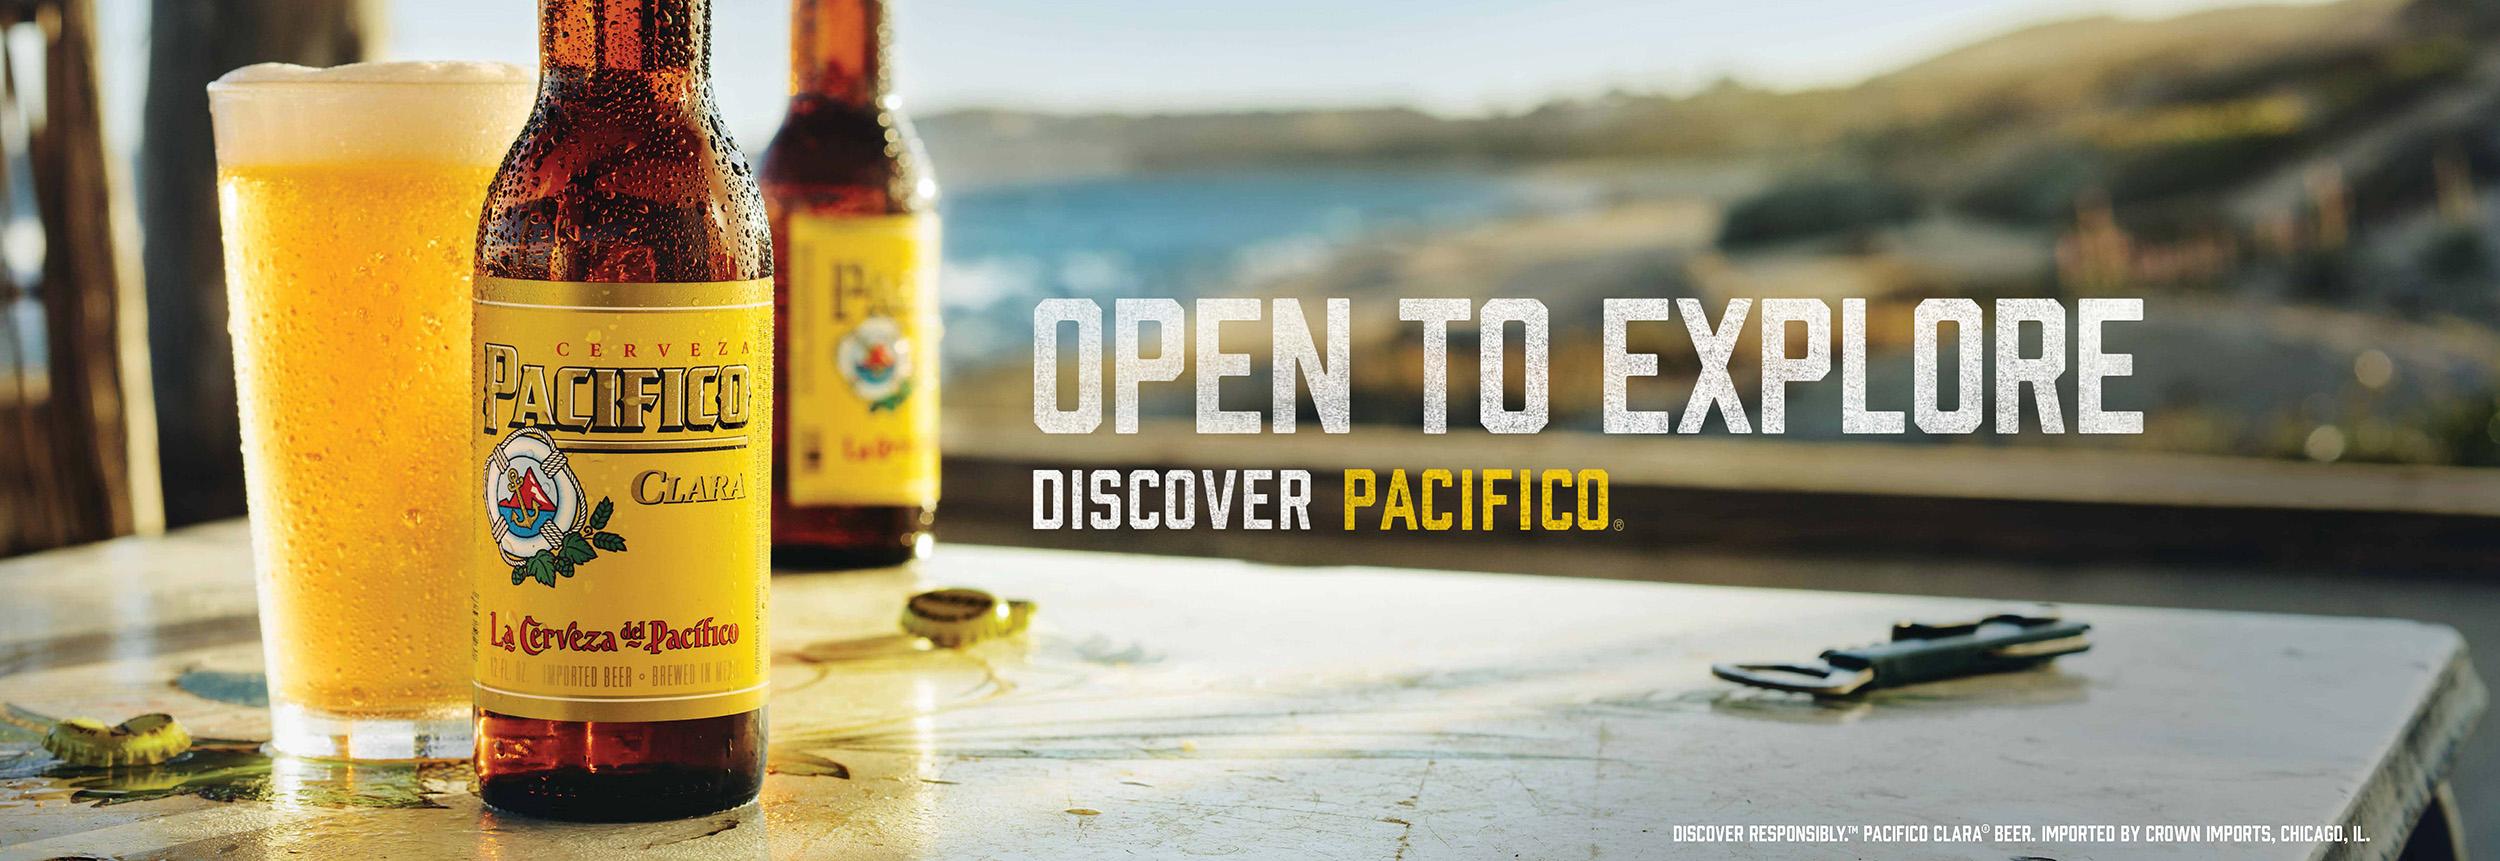 PACIFICO Horizontal Open to Explore.jpg